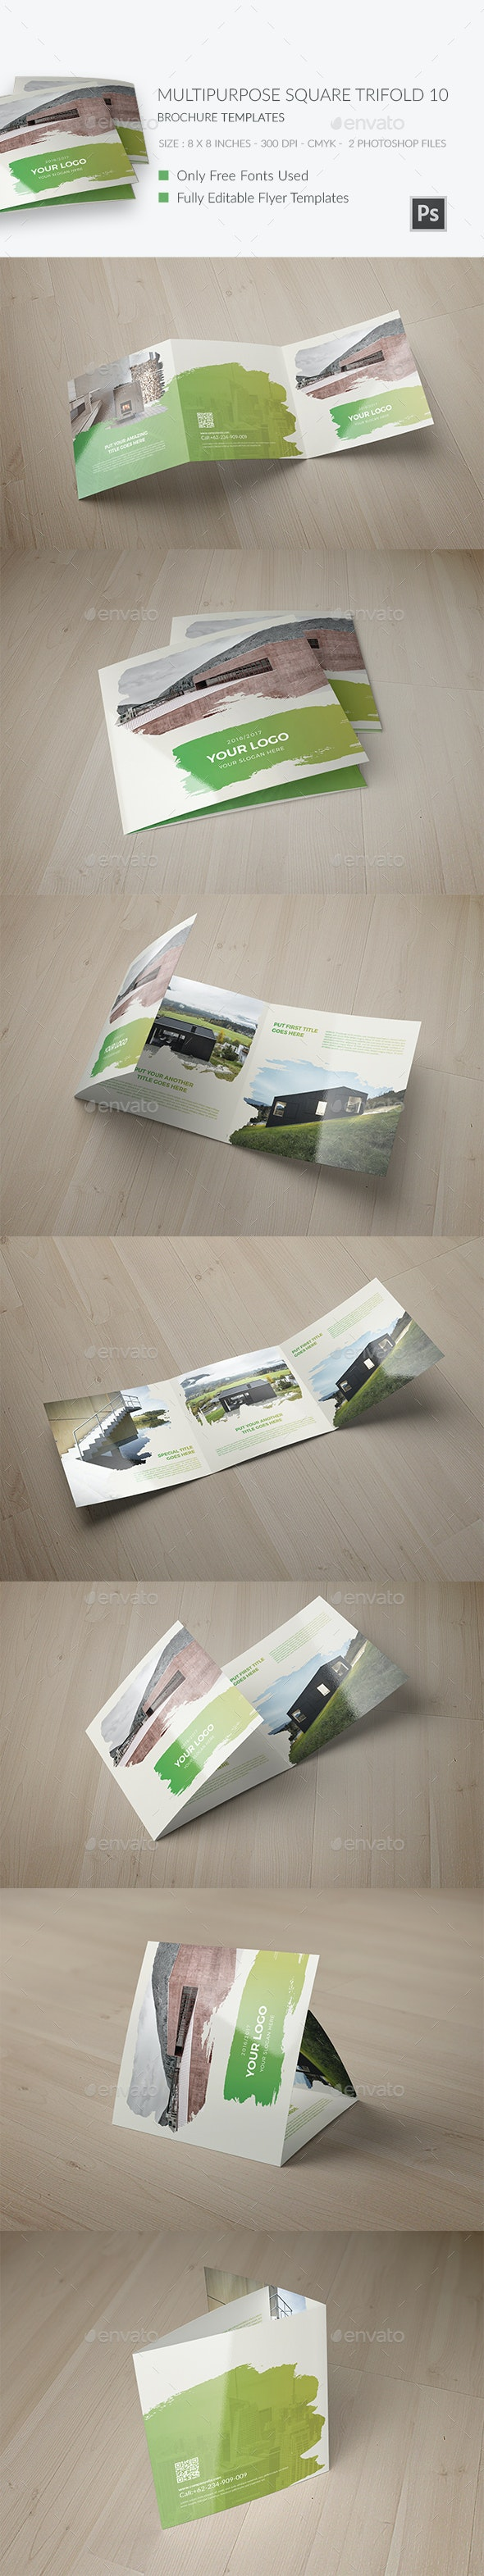 Multipurpose Square Trifold Brochure 10 - Corporate Brochures